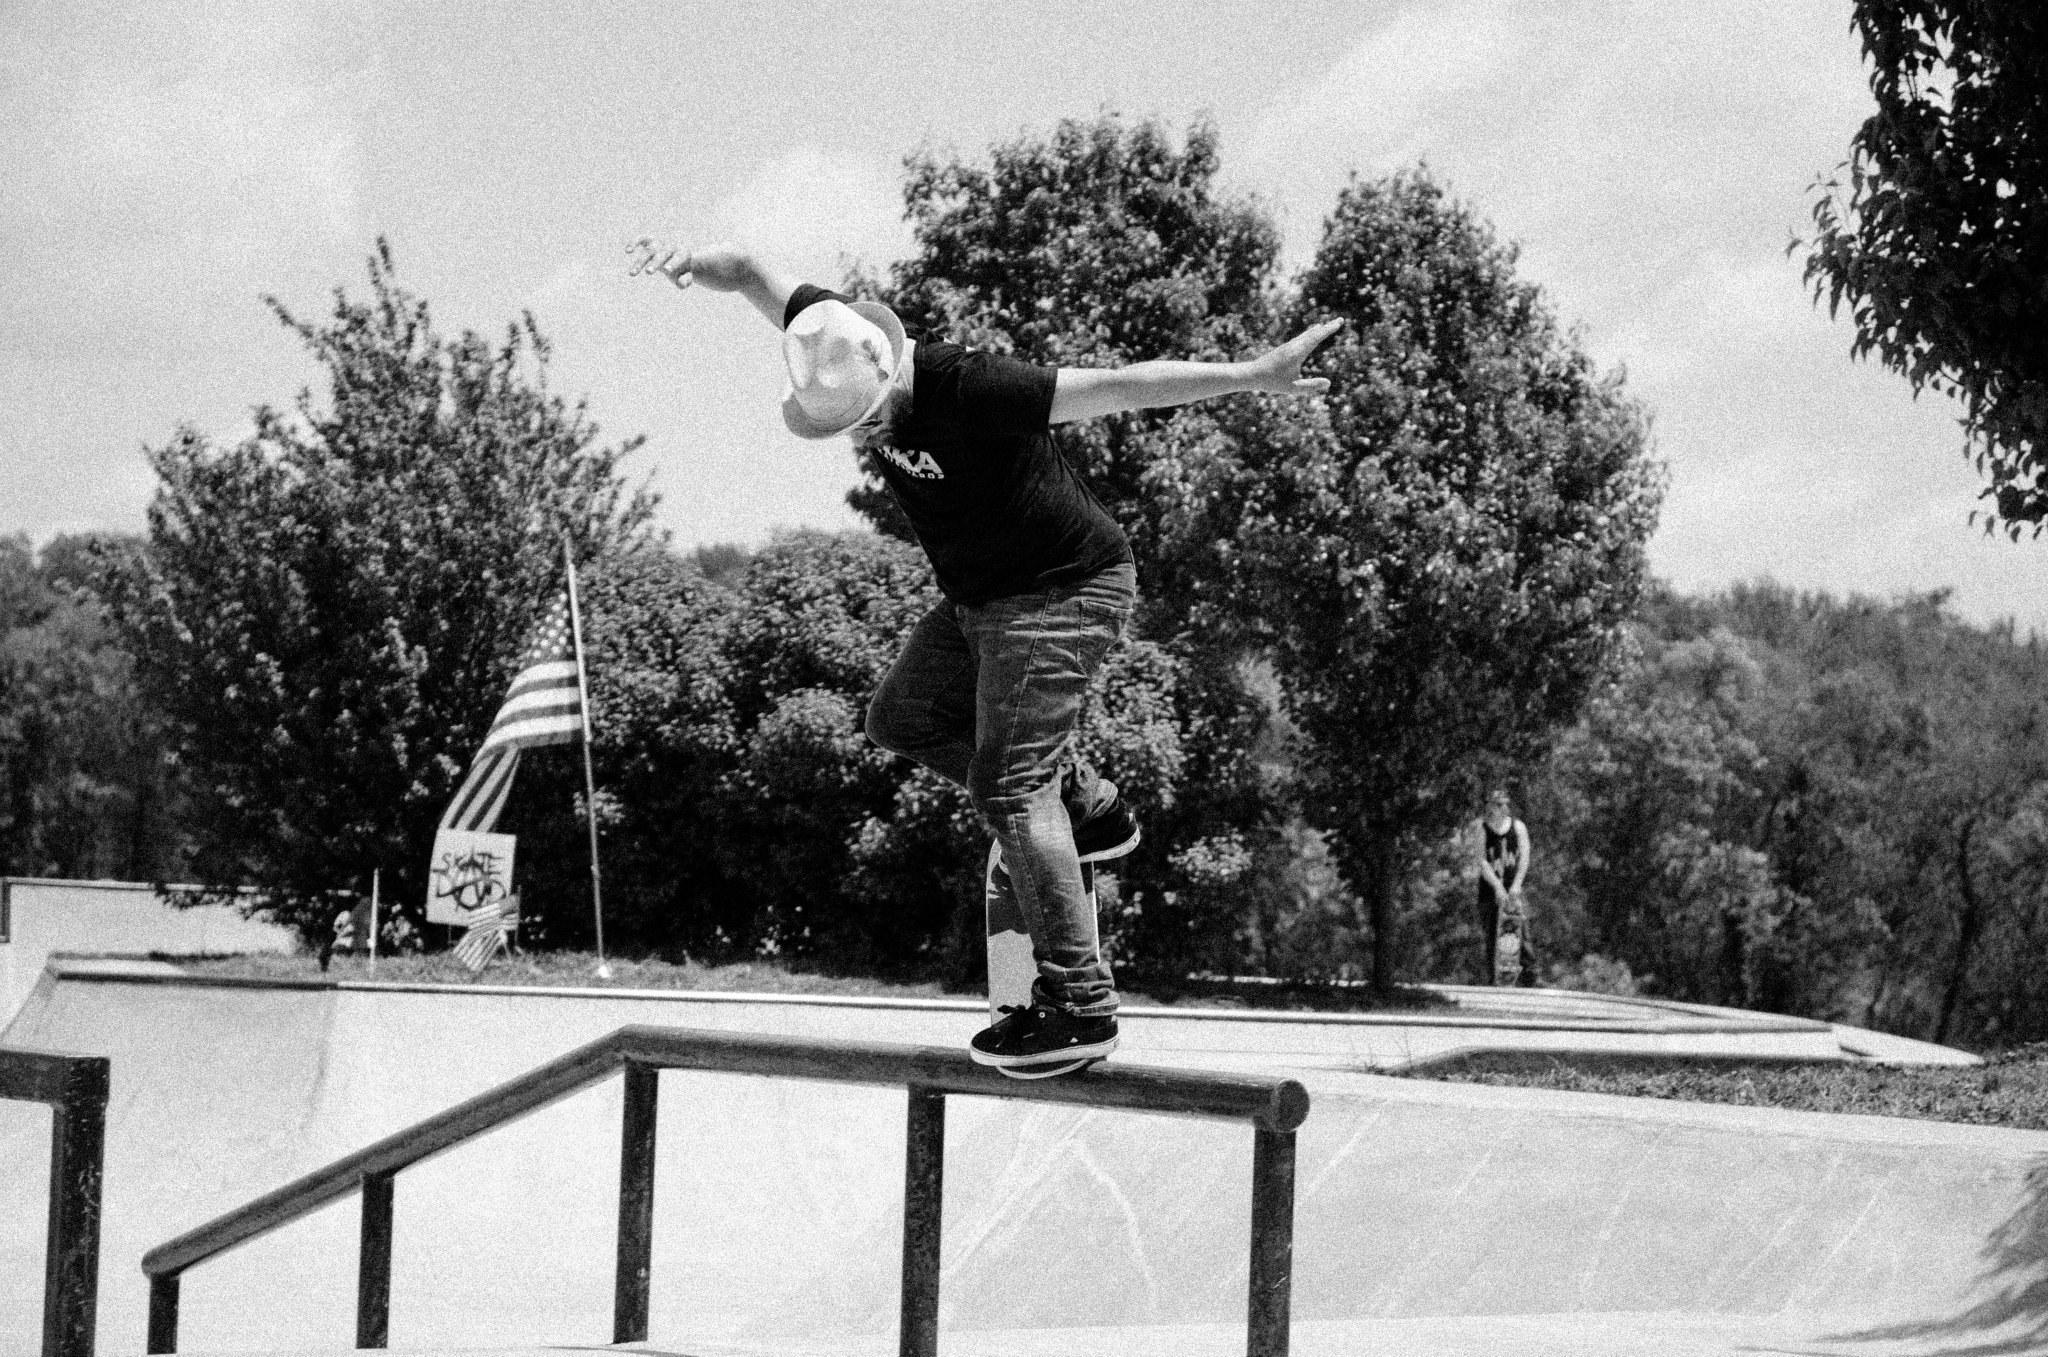 Dave Kaule - Backside overcrook